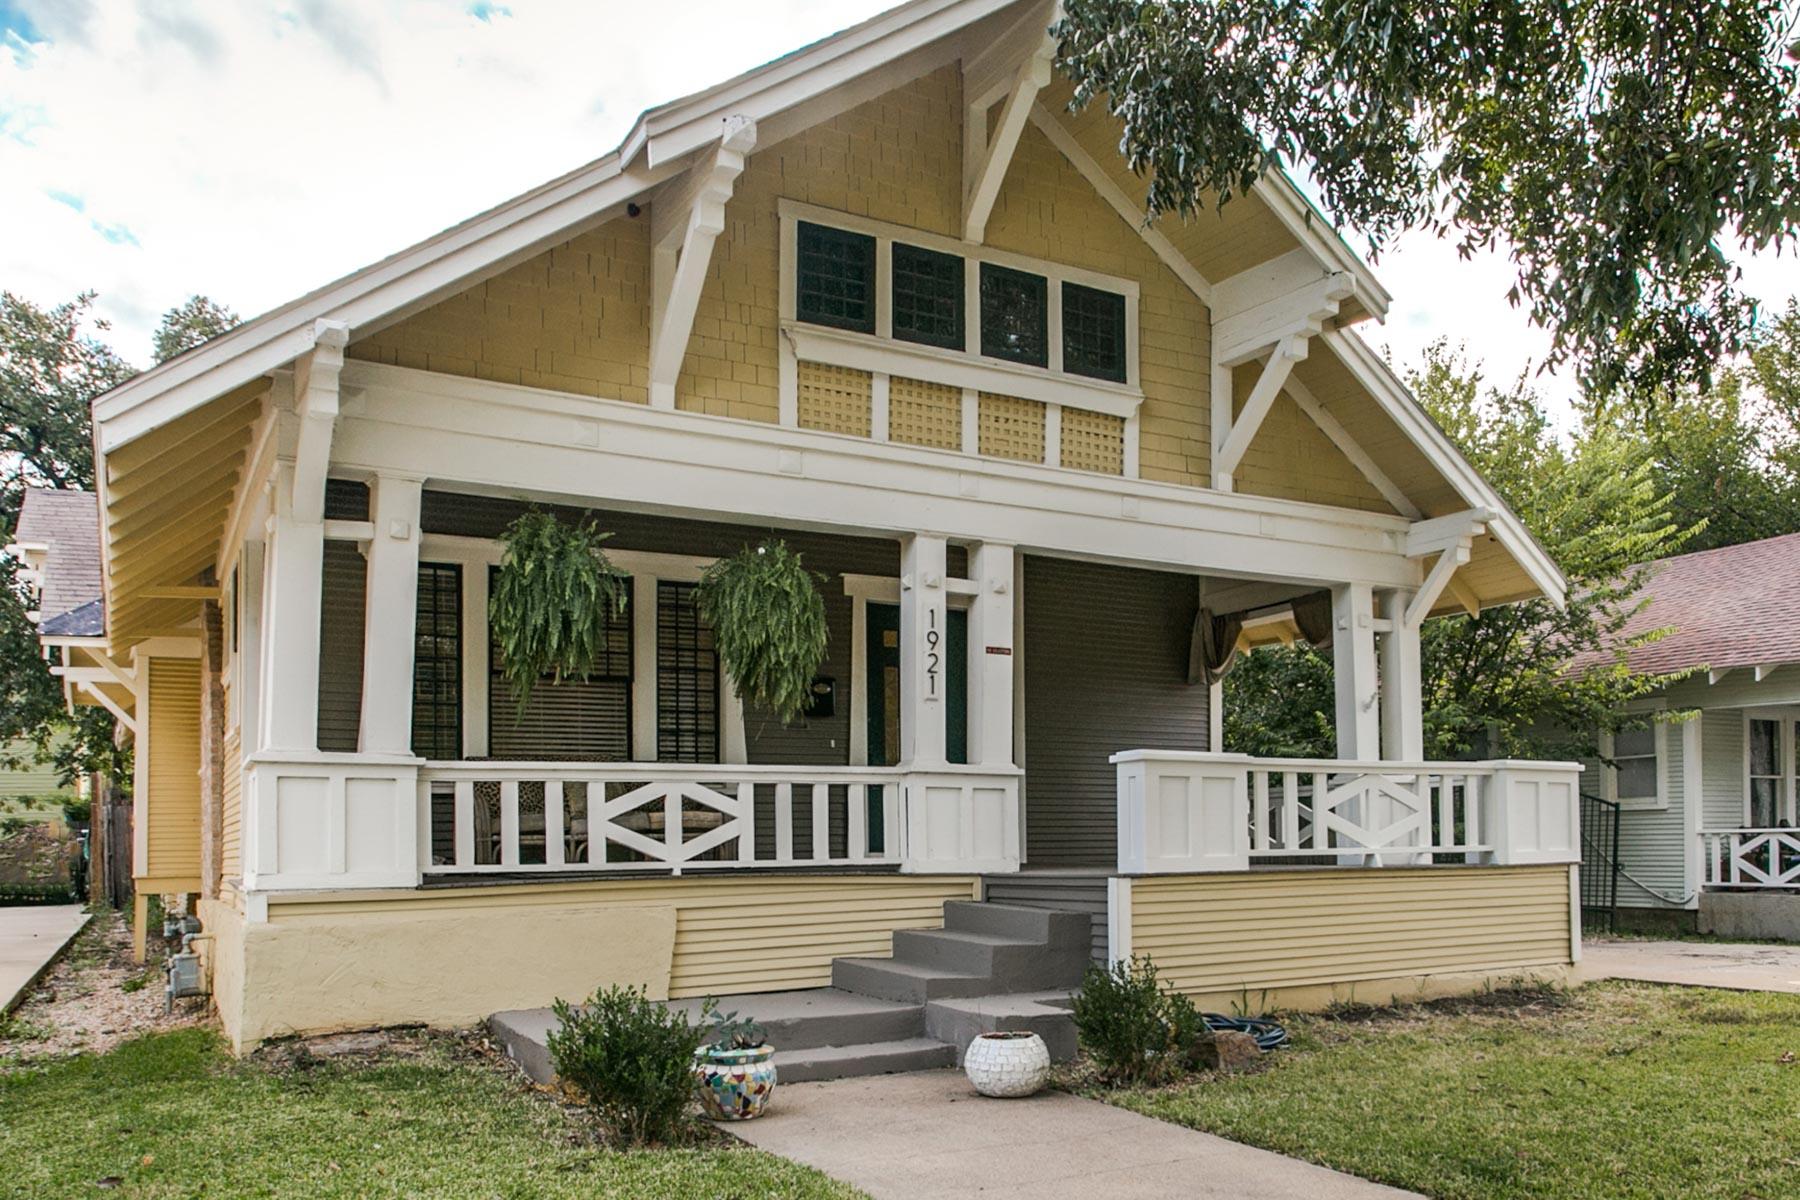 Moradia para Venda às 1921 Hurley Avenue, Fort Worth Fort Worth, Texas, 76110 Estados Unidos